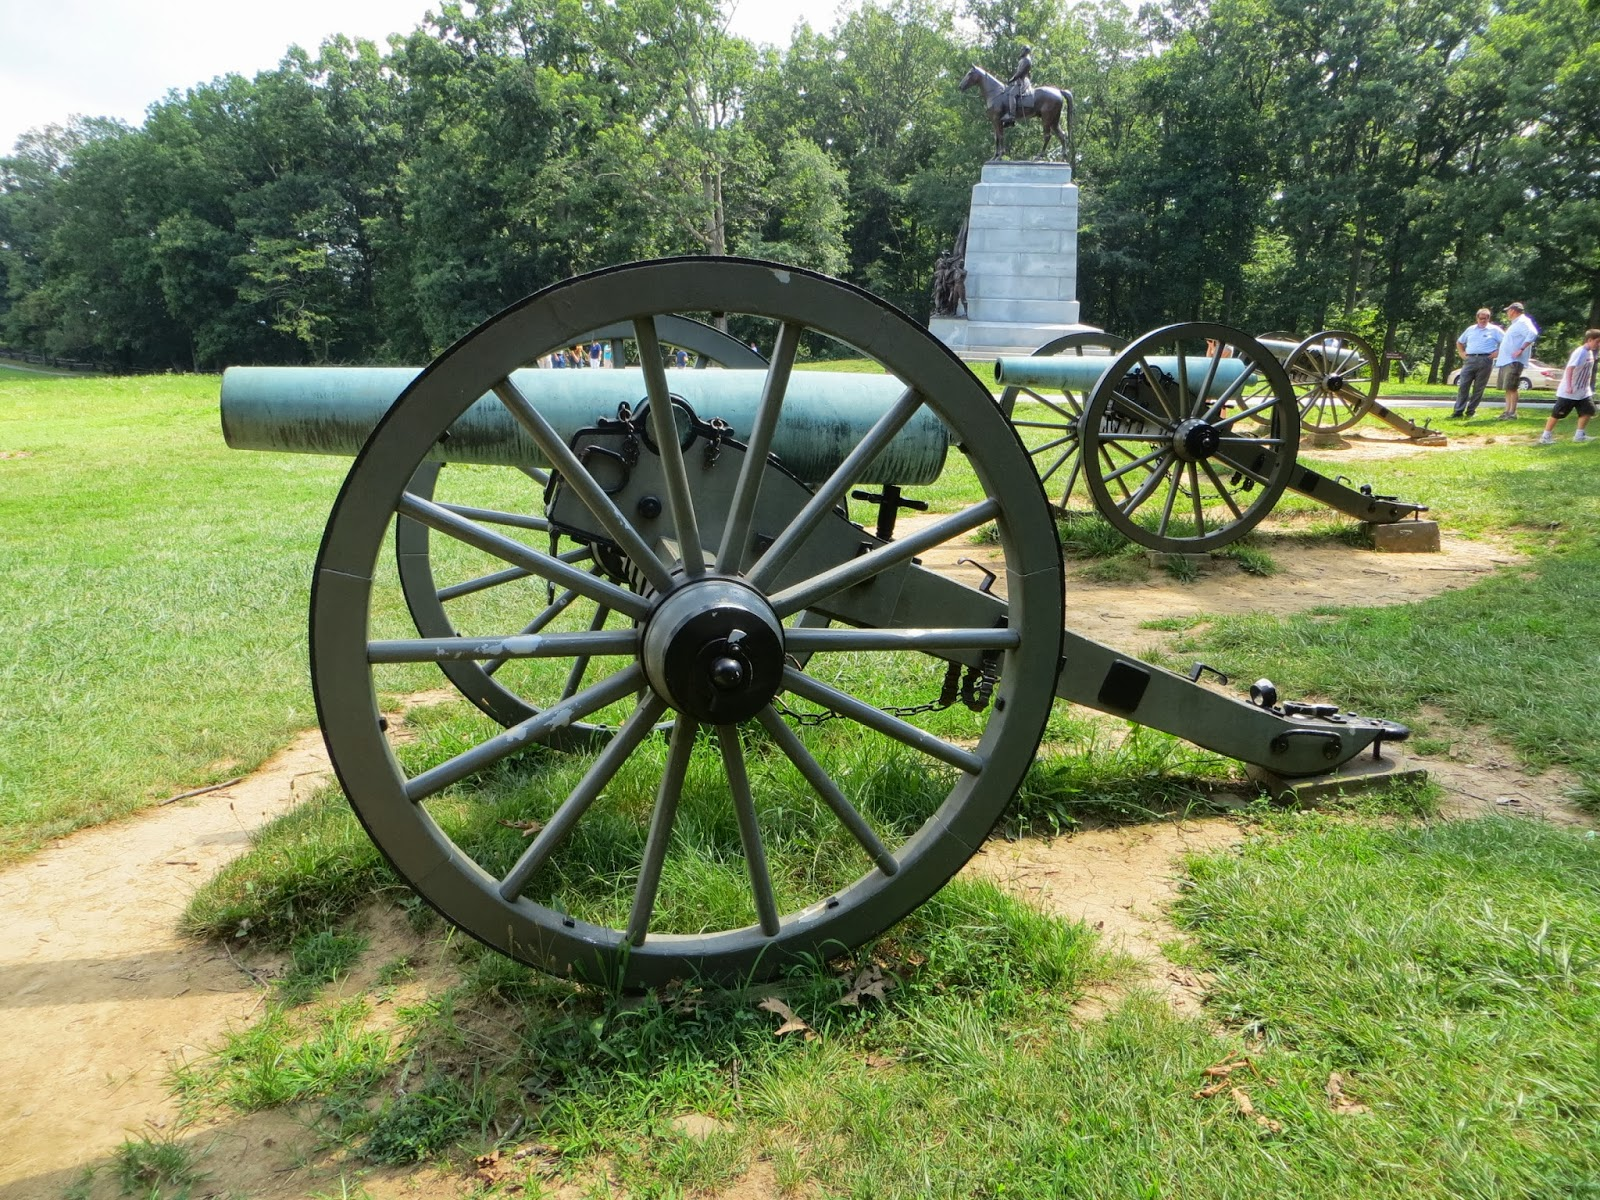 killer angels essay robinson crusoe analysis angel masters thesis  battle essay gettysburg will write travel photo essay gettysburg national military park will write travel will